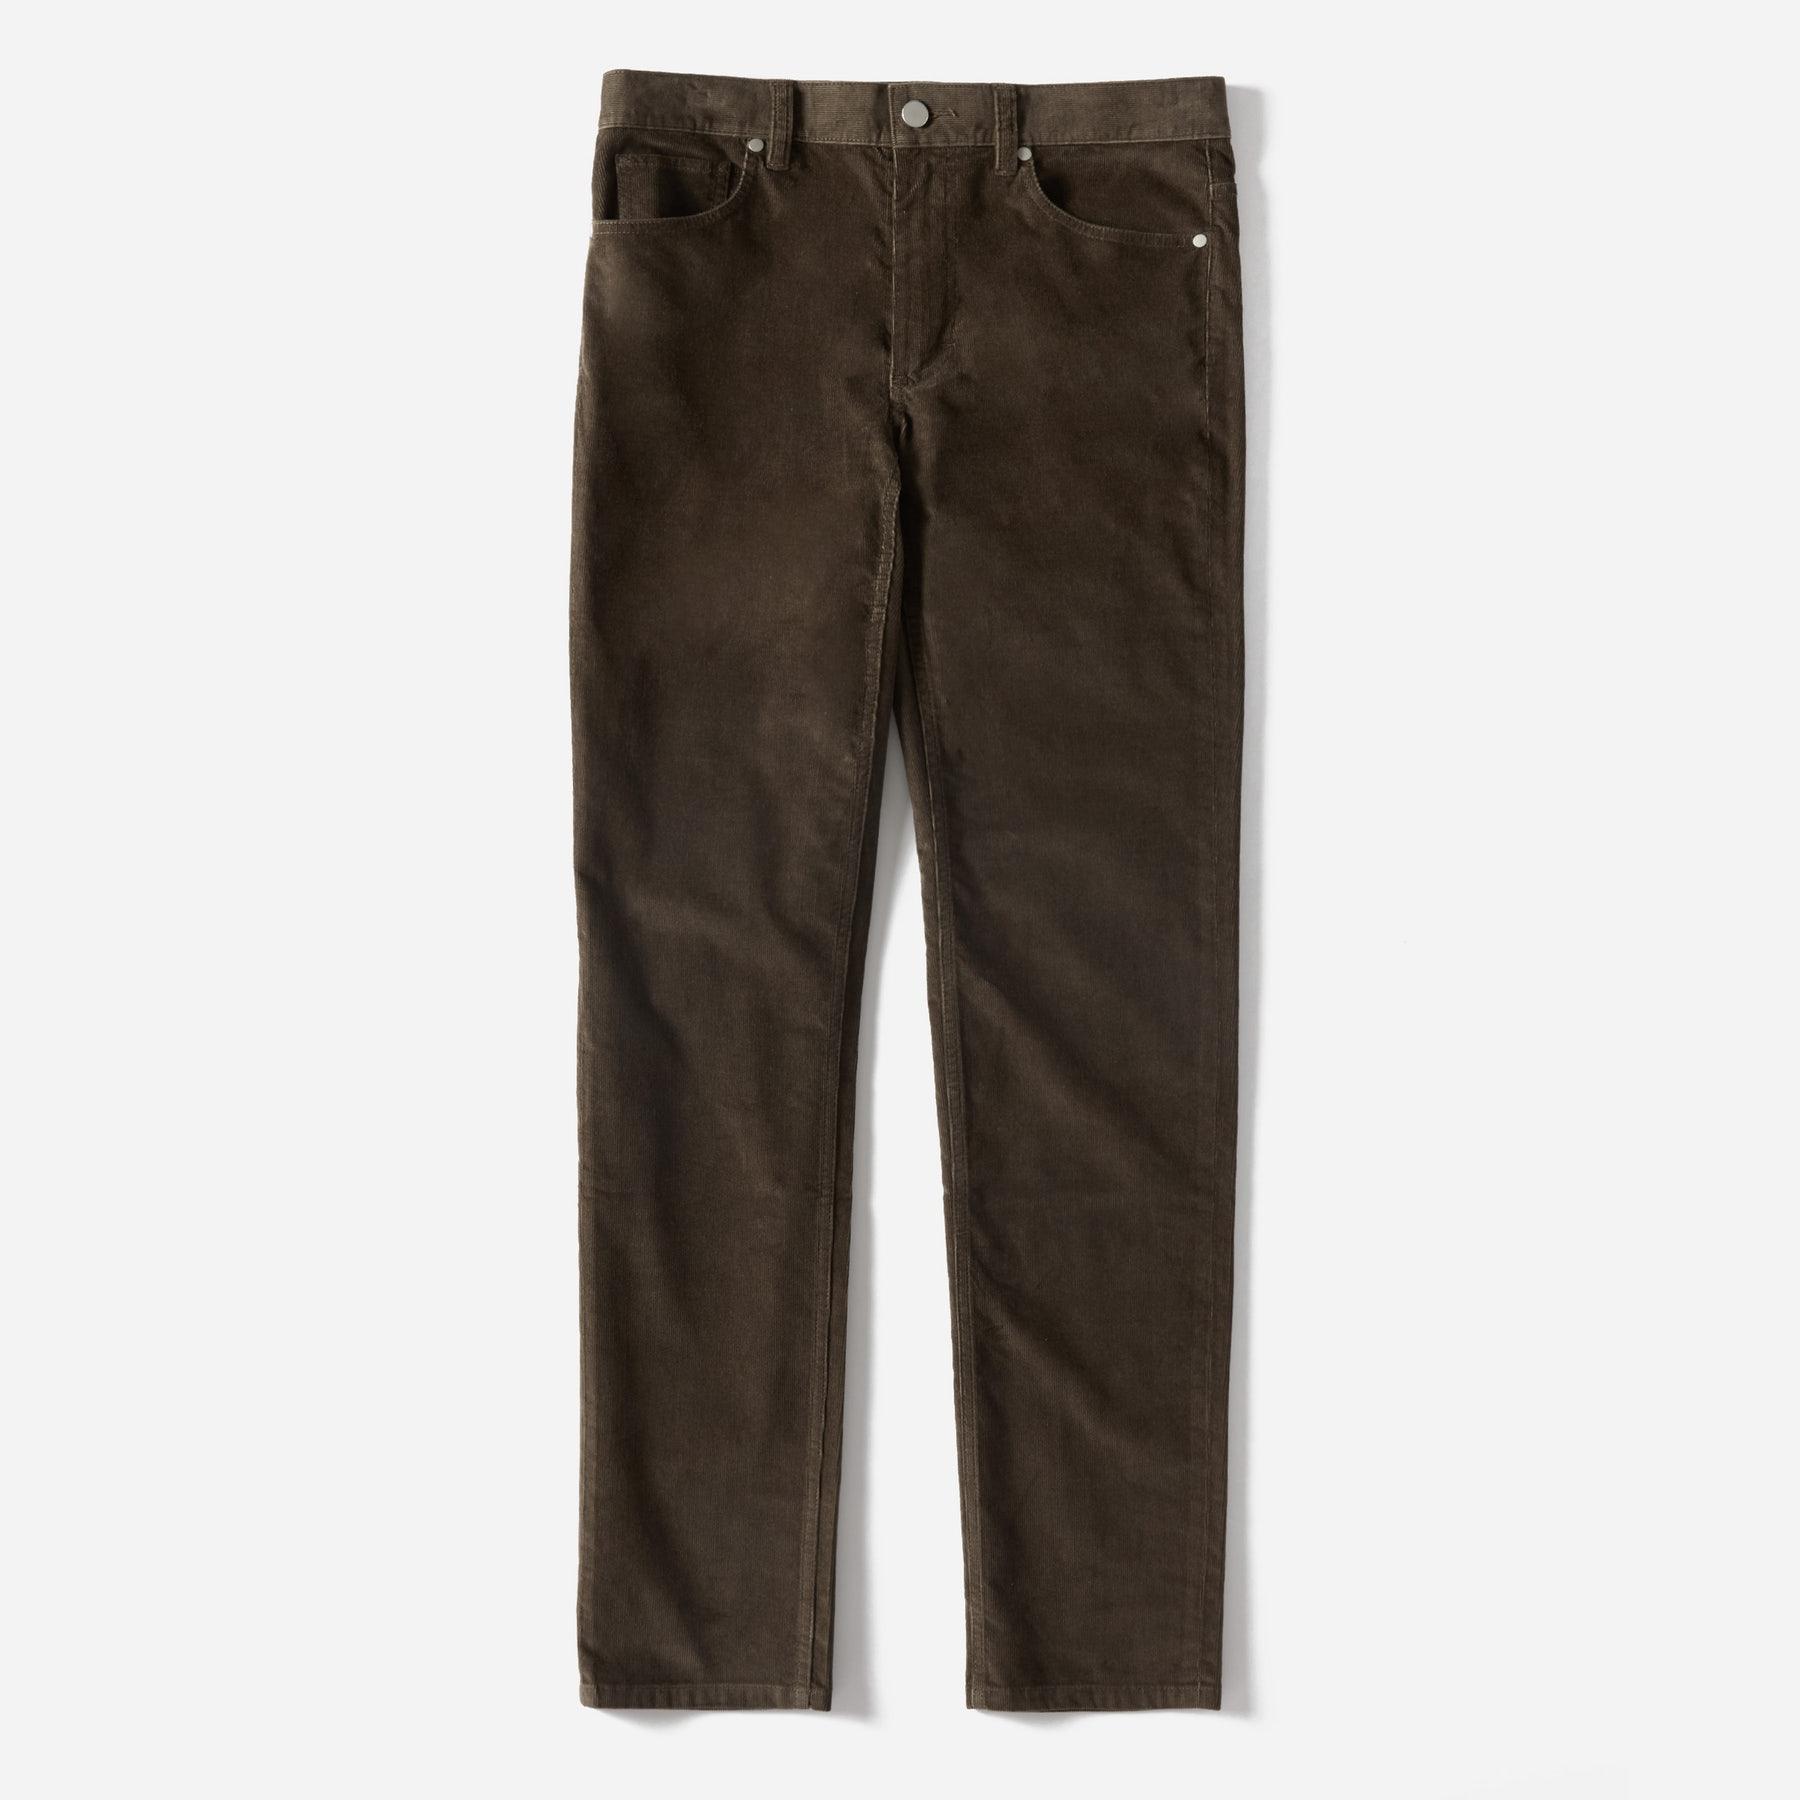 Everlane Corduroy 5-Pocket Slim Pant